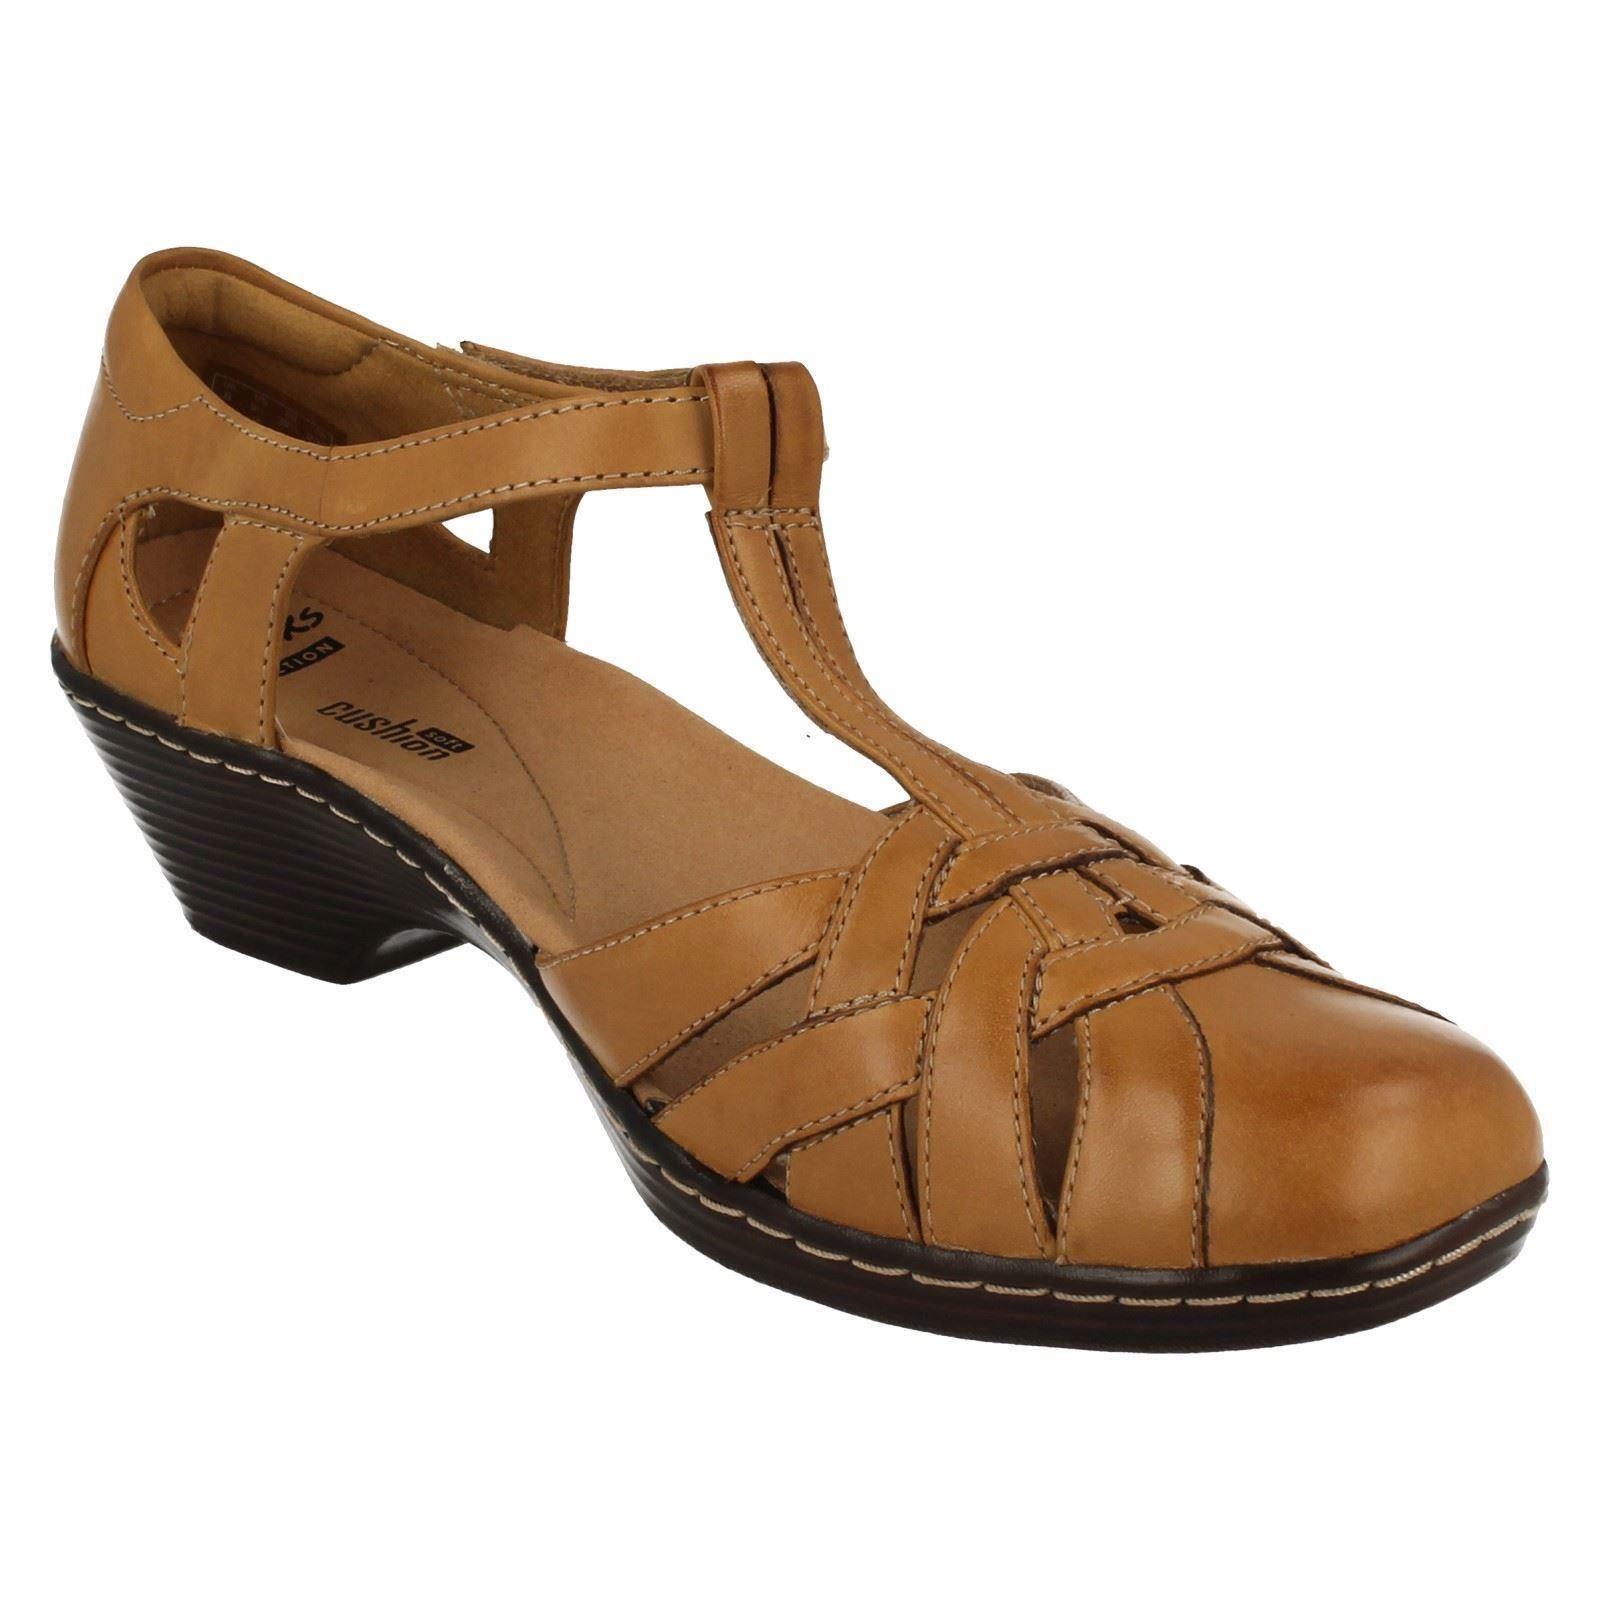 Clarks Loras Shoes